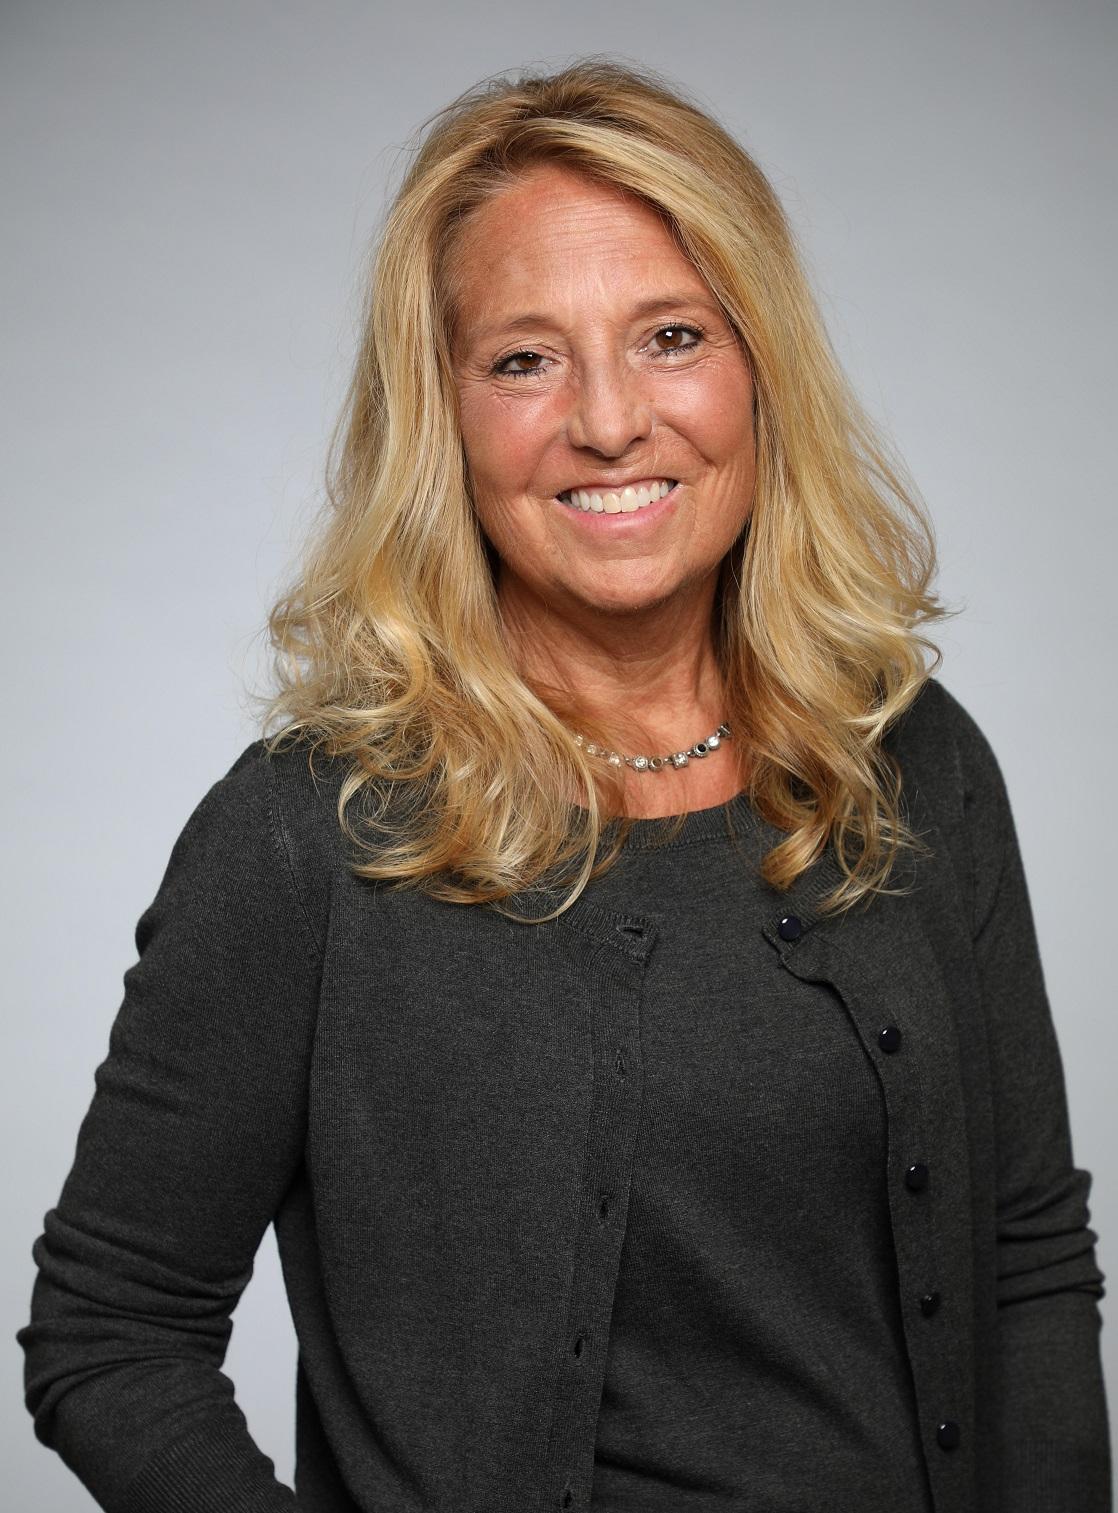 Nicole Heller